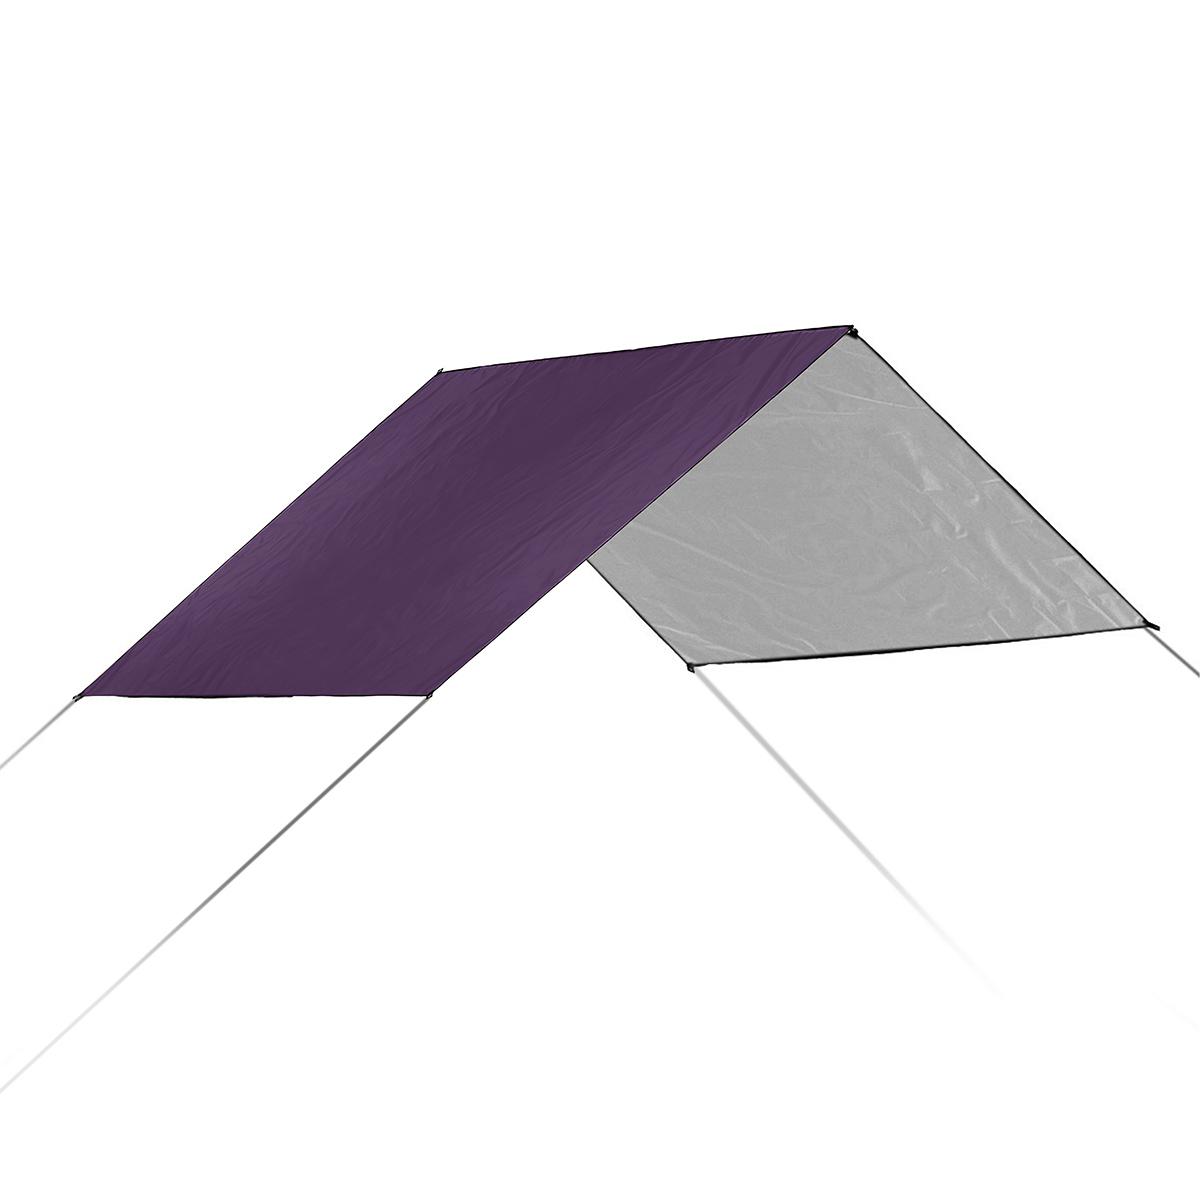 3x3m Multifunction Anit-UV Tent Tarp Rain Sun Shade Awning Shelter Hammock Picnic Mat for Camping Hiking Travel